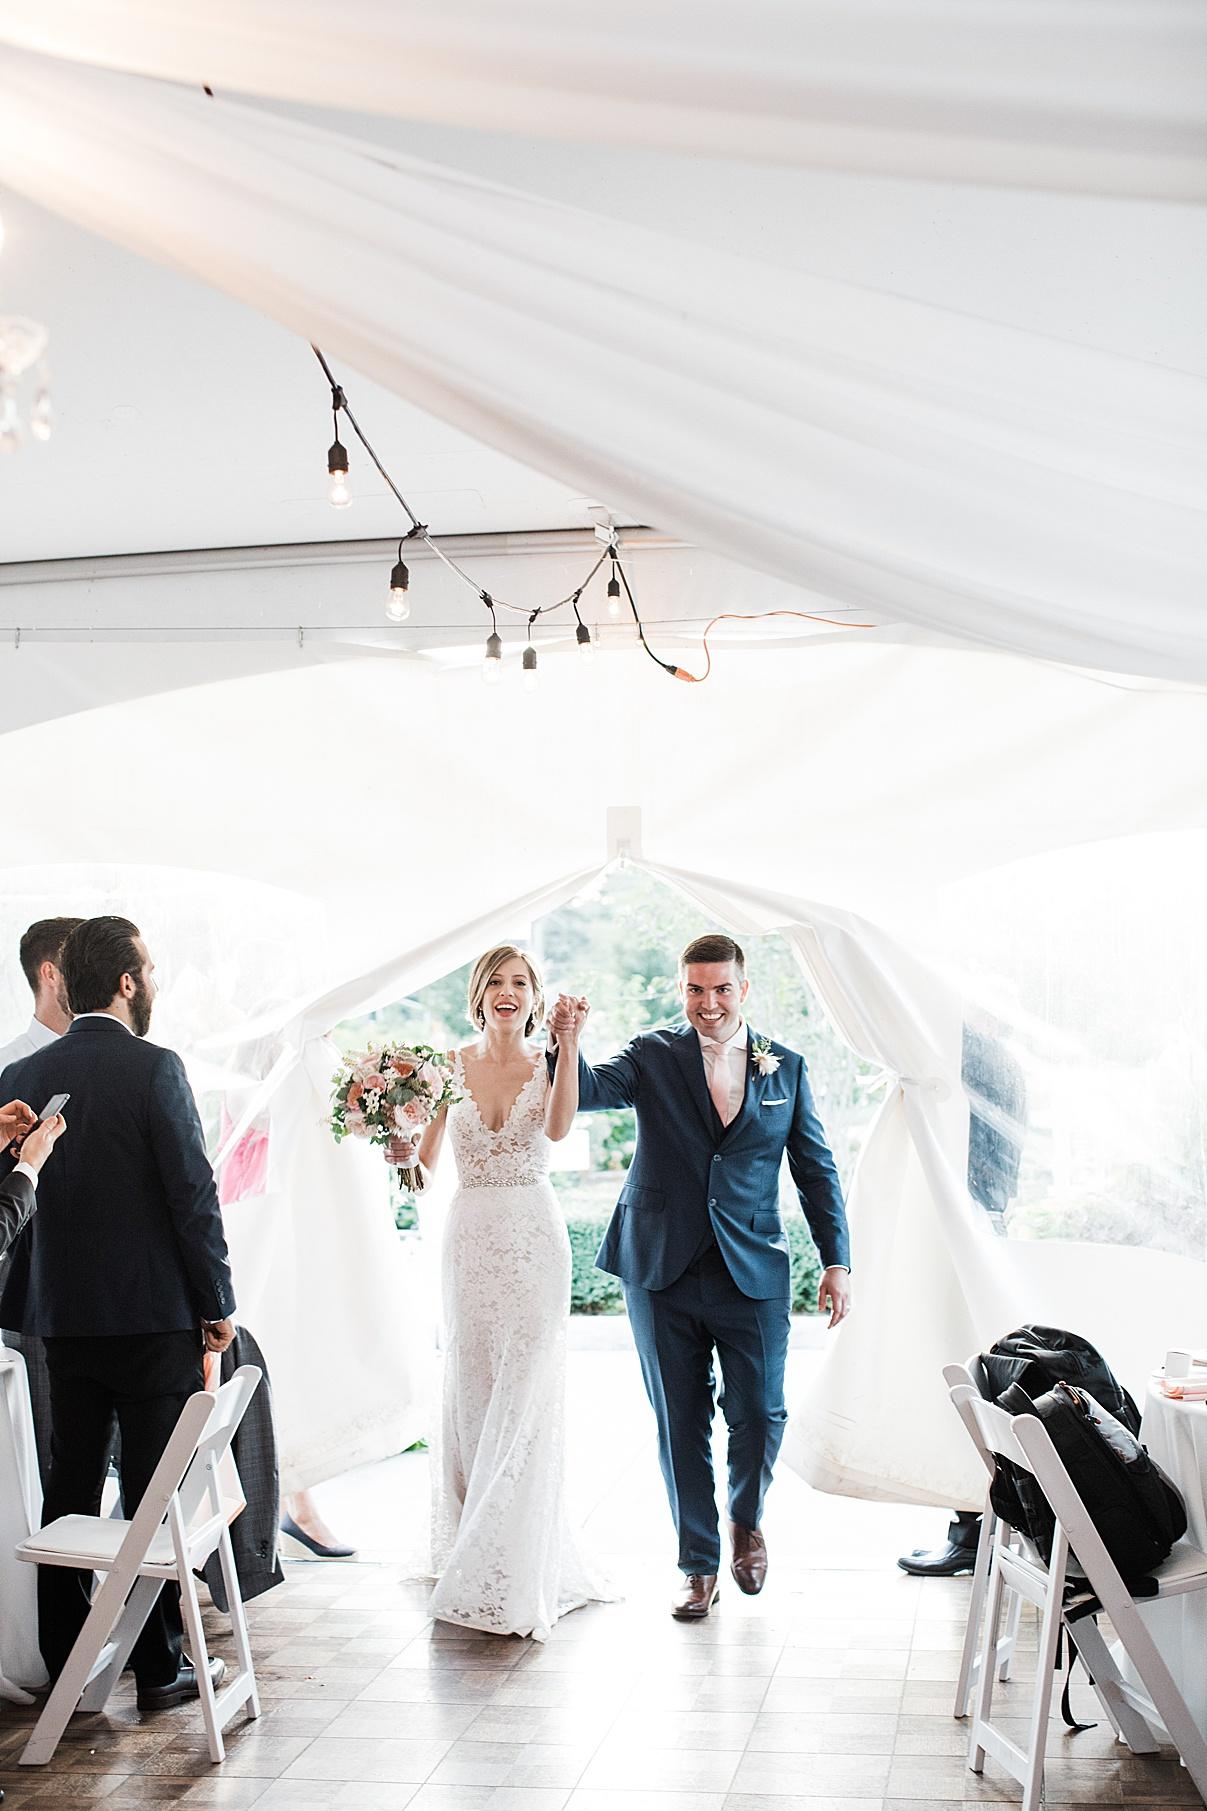 Bride and groom entering wedding reception| Harding Waterfront Estate Wedding| Ontario wedding photographer| Toronto wedding photographer| 3 Photography | 3photography.ca